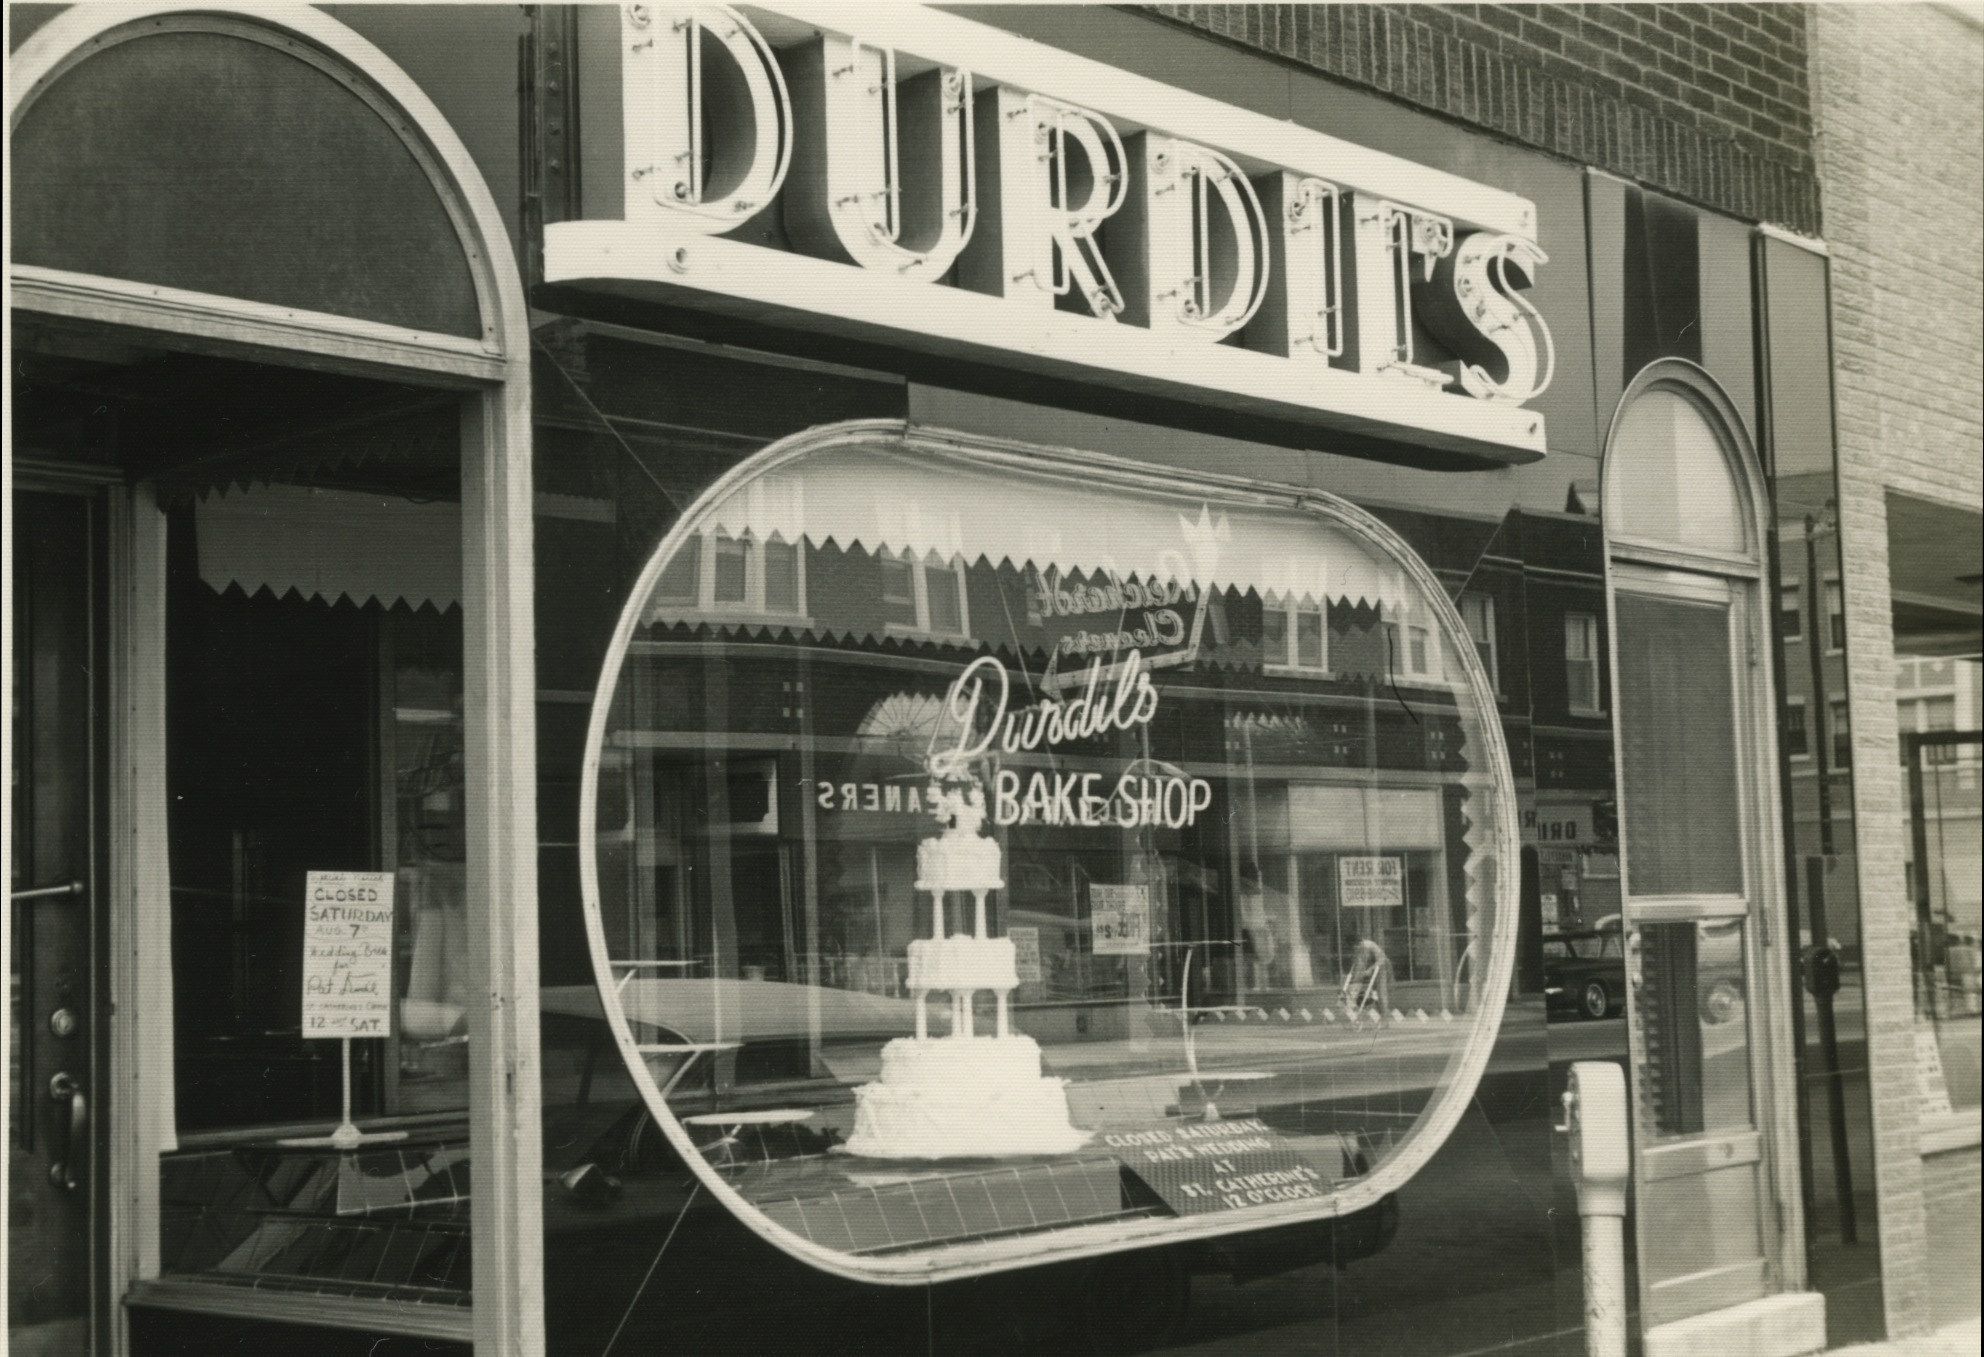 Durdil's bake shop where my mom grew up